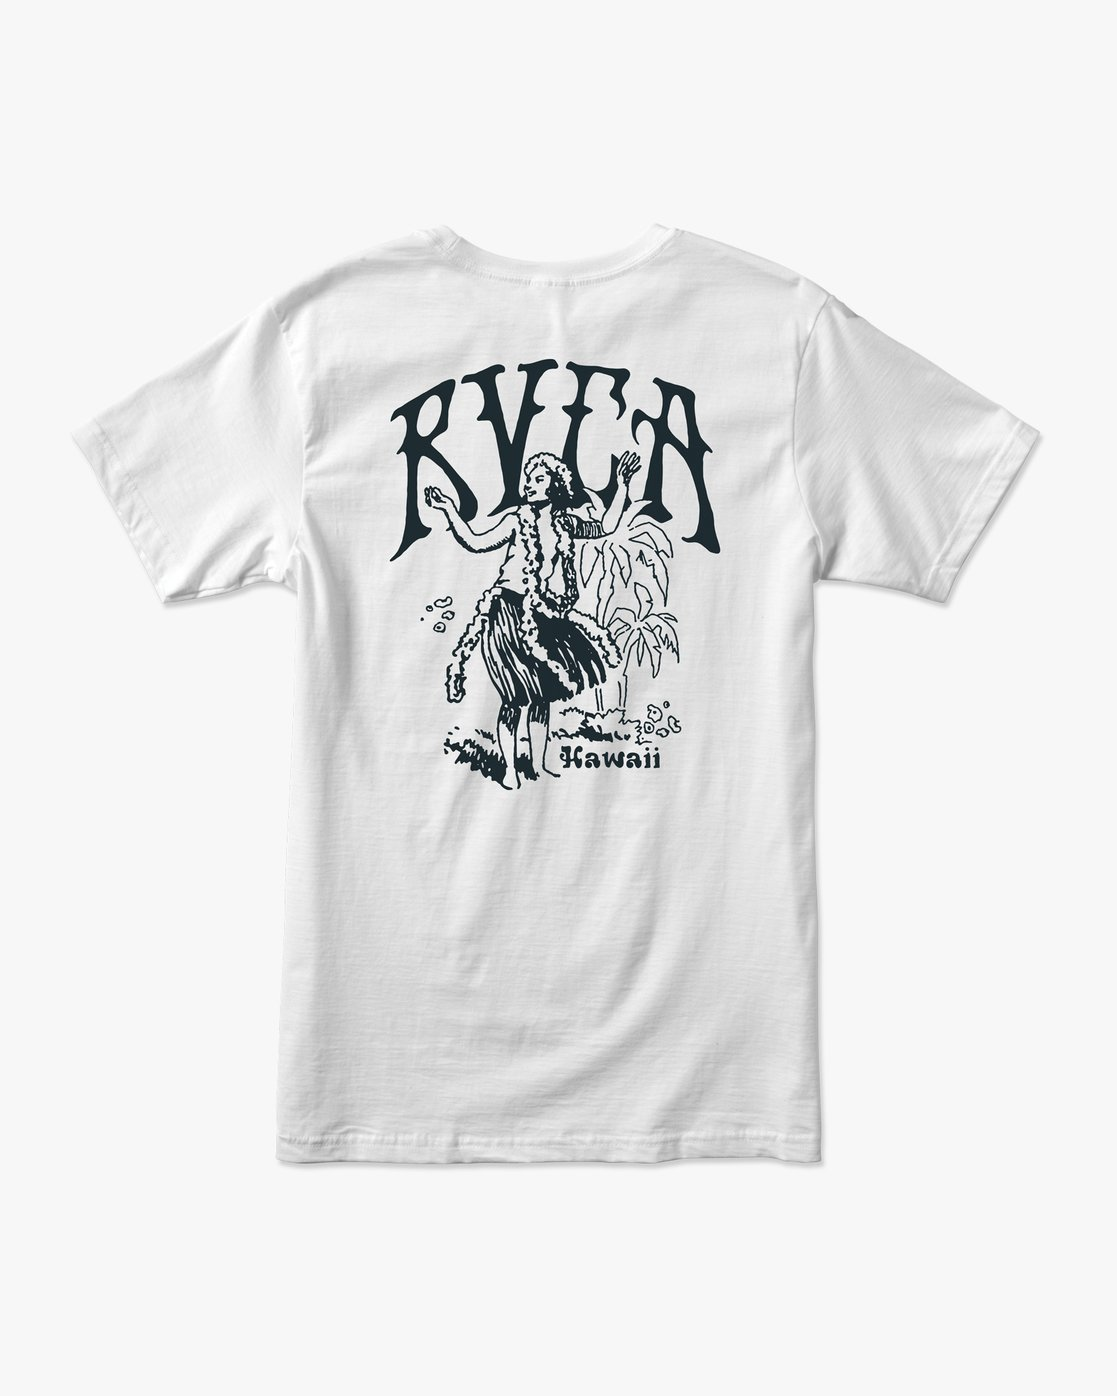 0 Ancell Hi Hula T-Shirt White M401URHH RVCA